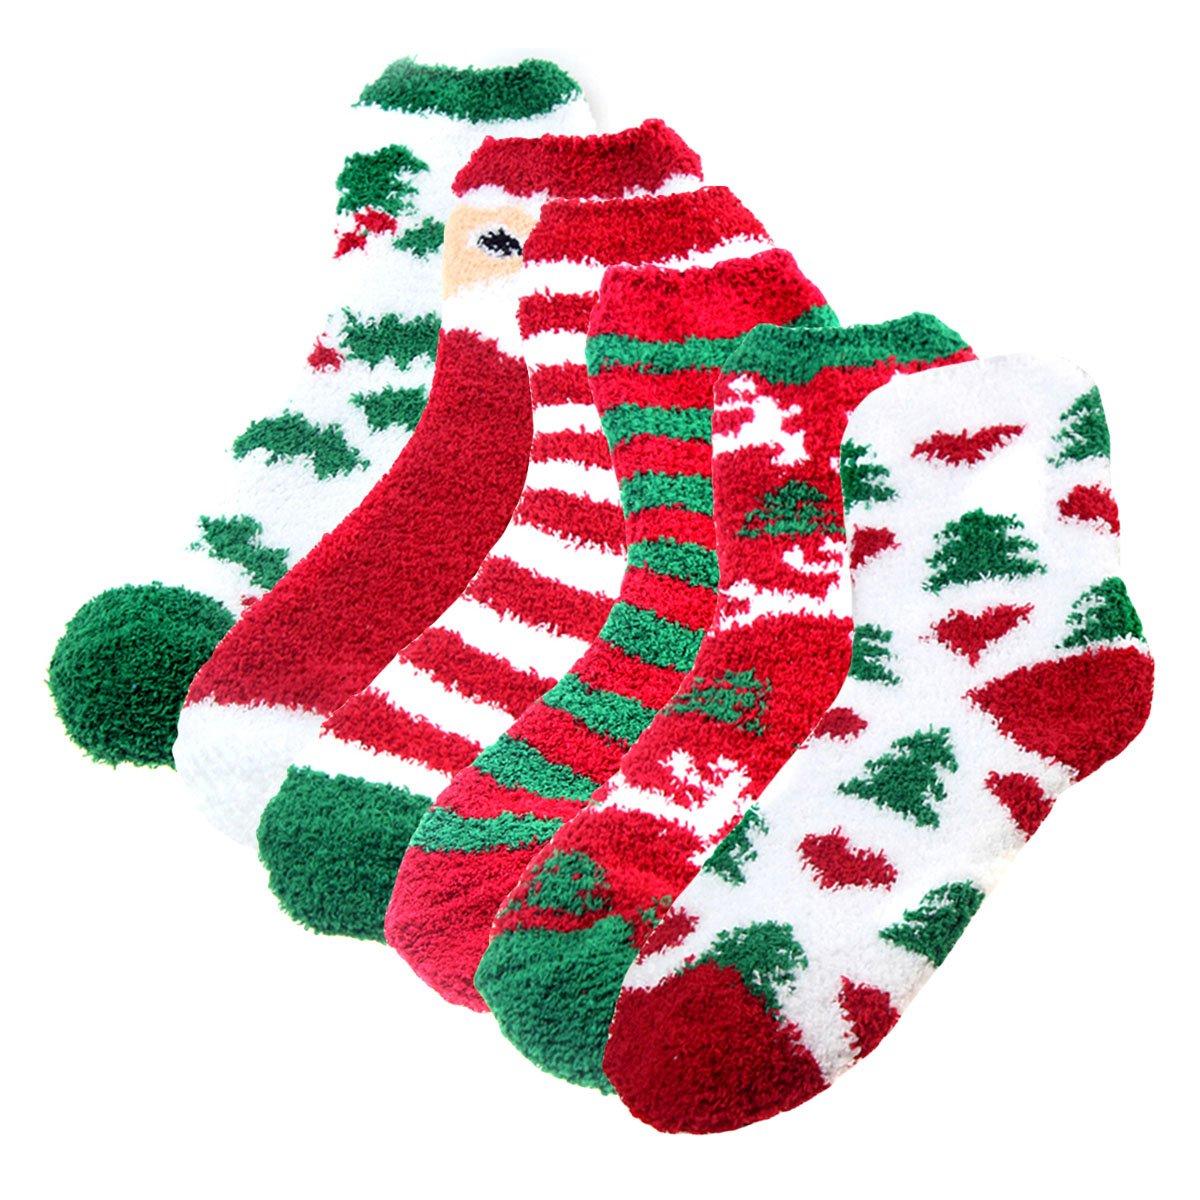 Aivtalk Womens Christmas Holiday Striped Fuzzy Crew Socks 6 Pair Pack